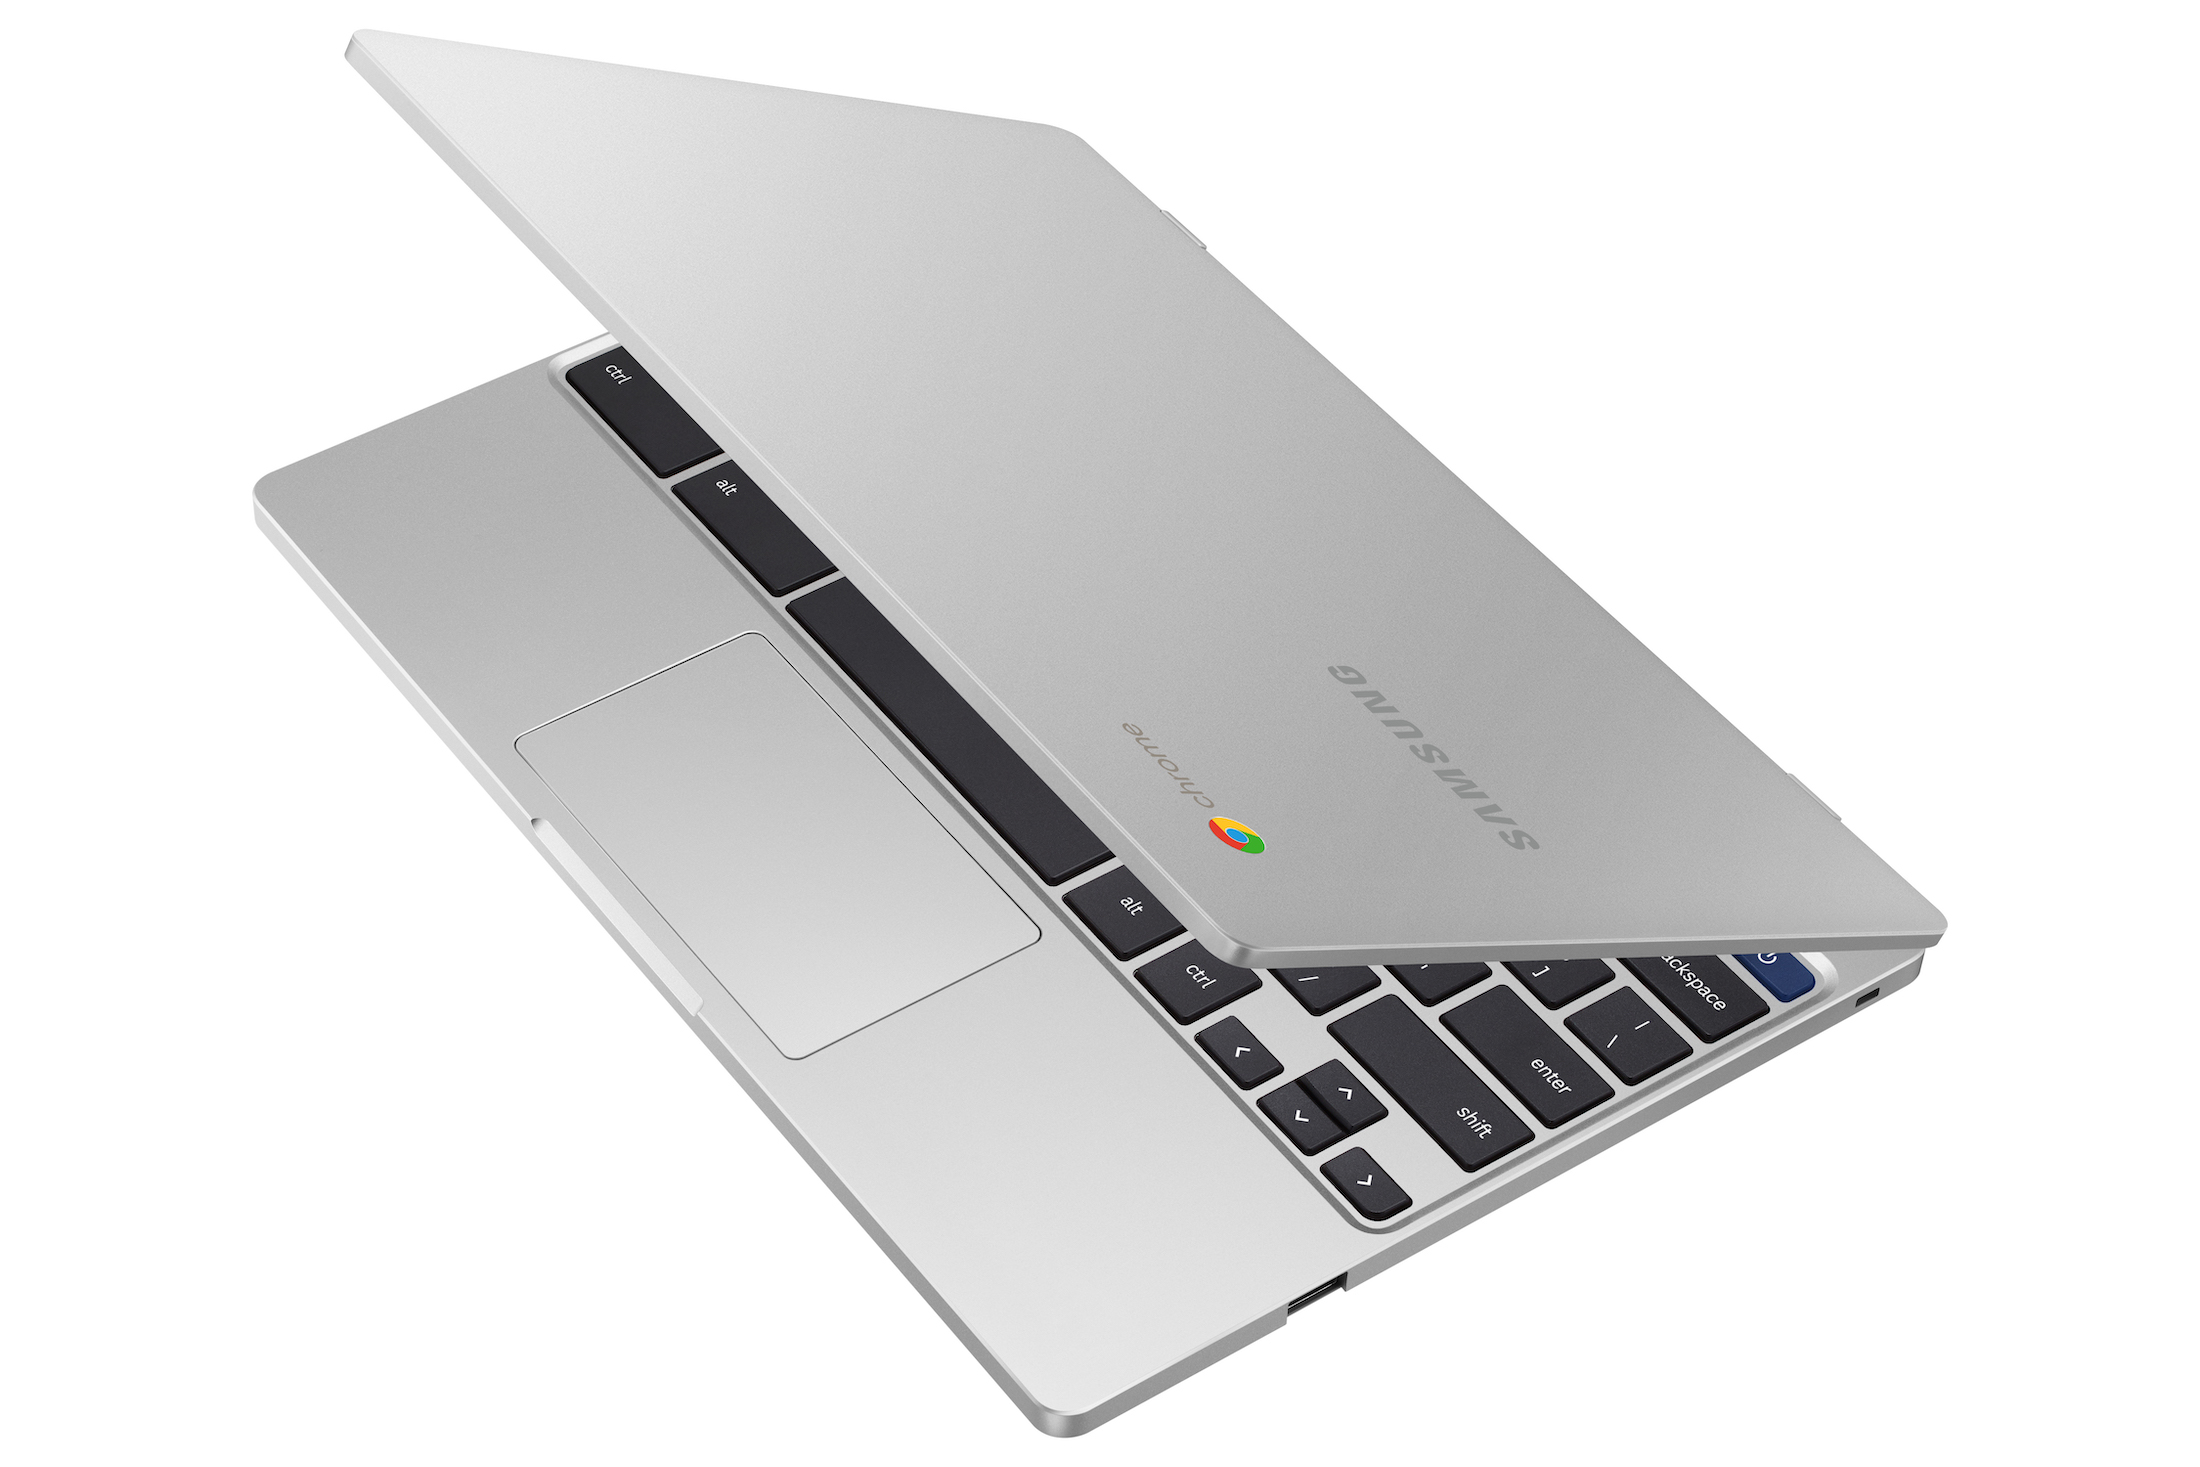 samsung chromebook 4 half open 364x205 - Samsung's latest Chromebook 4 and 4+ are pretty good deals